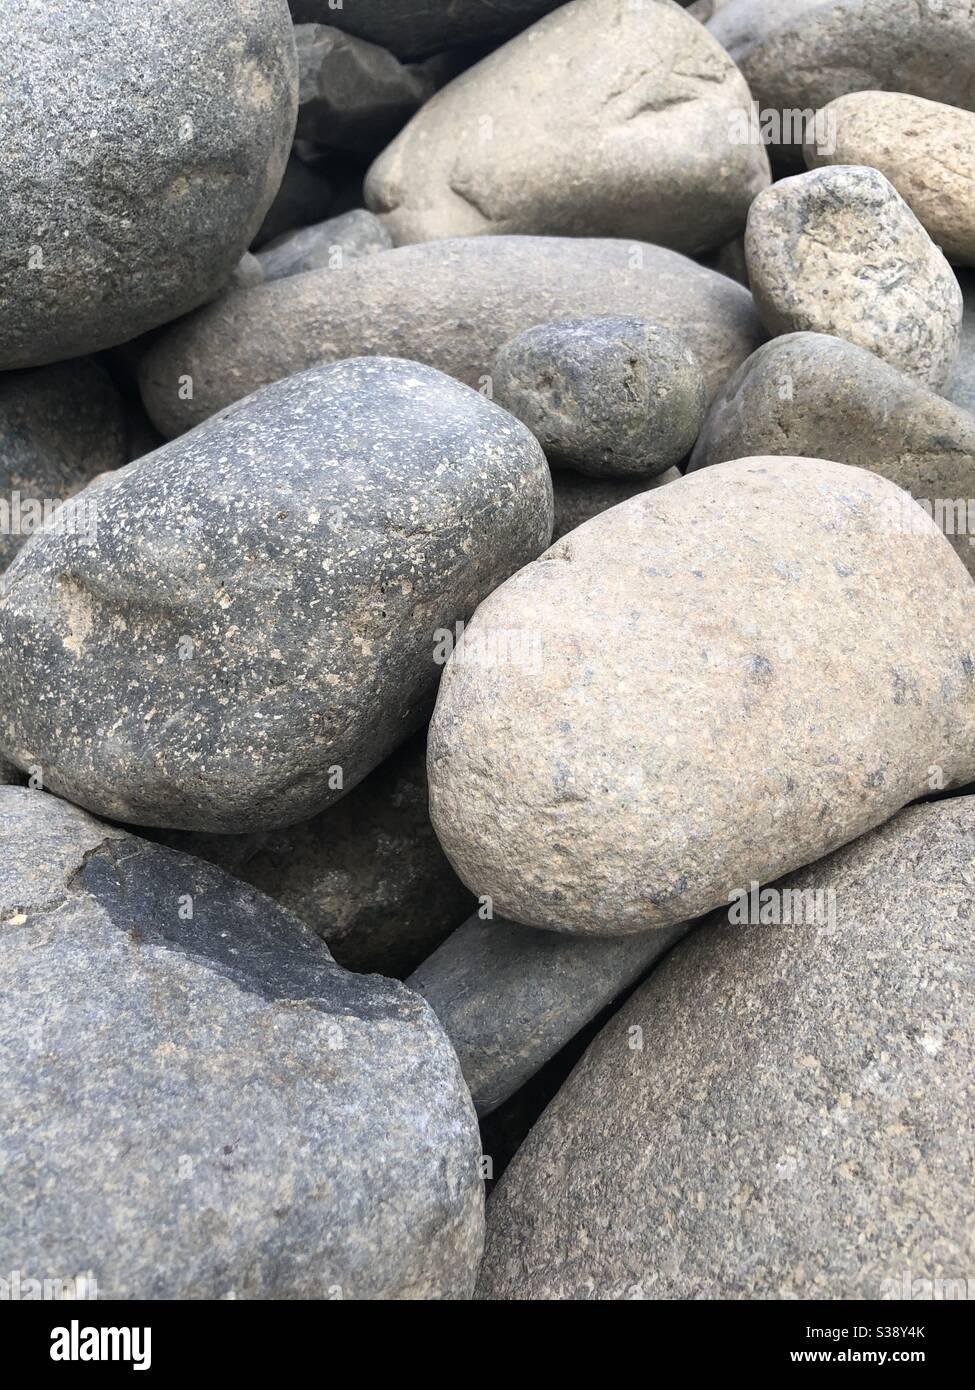 rocks at a beach Stock Photo